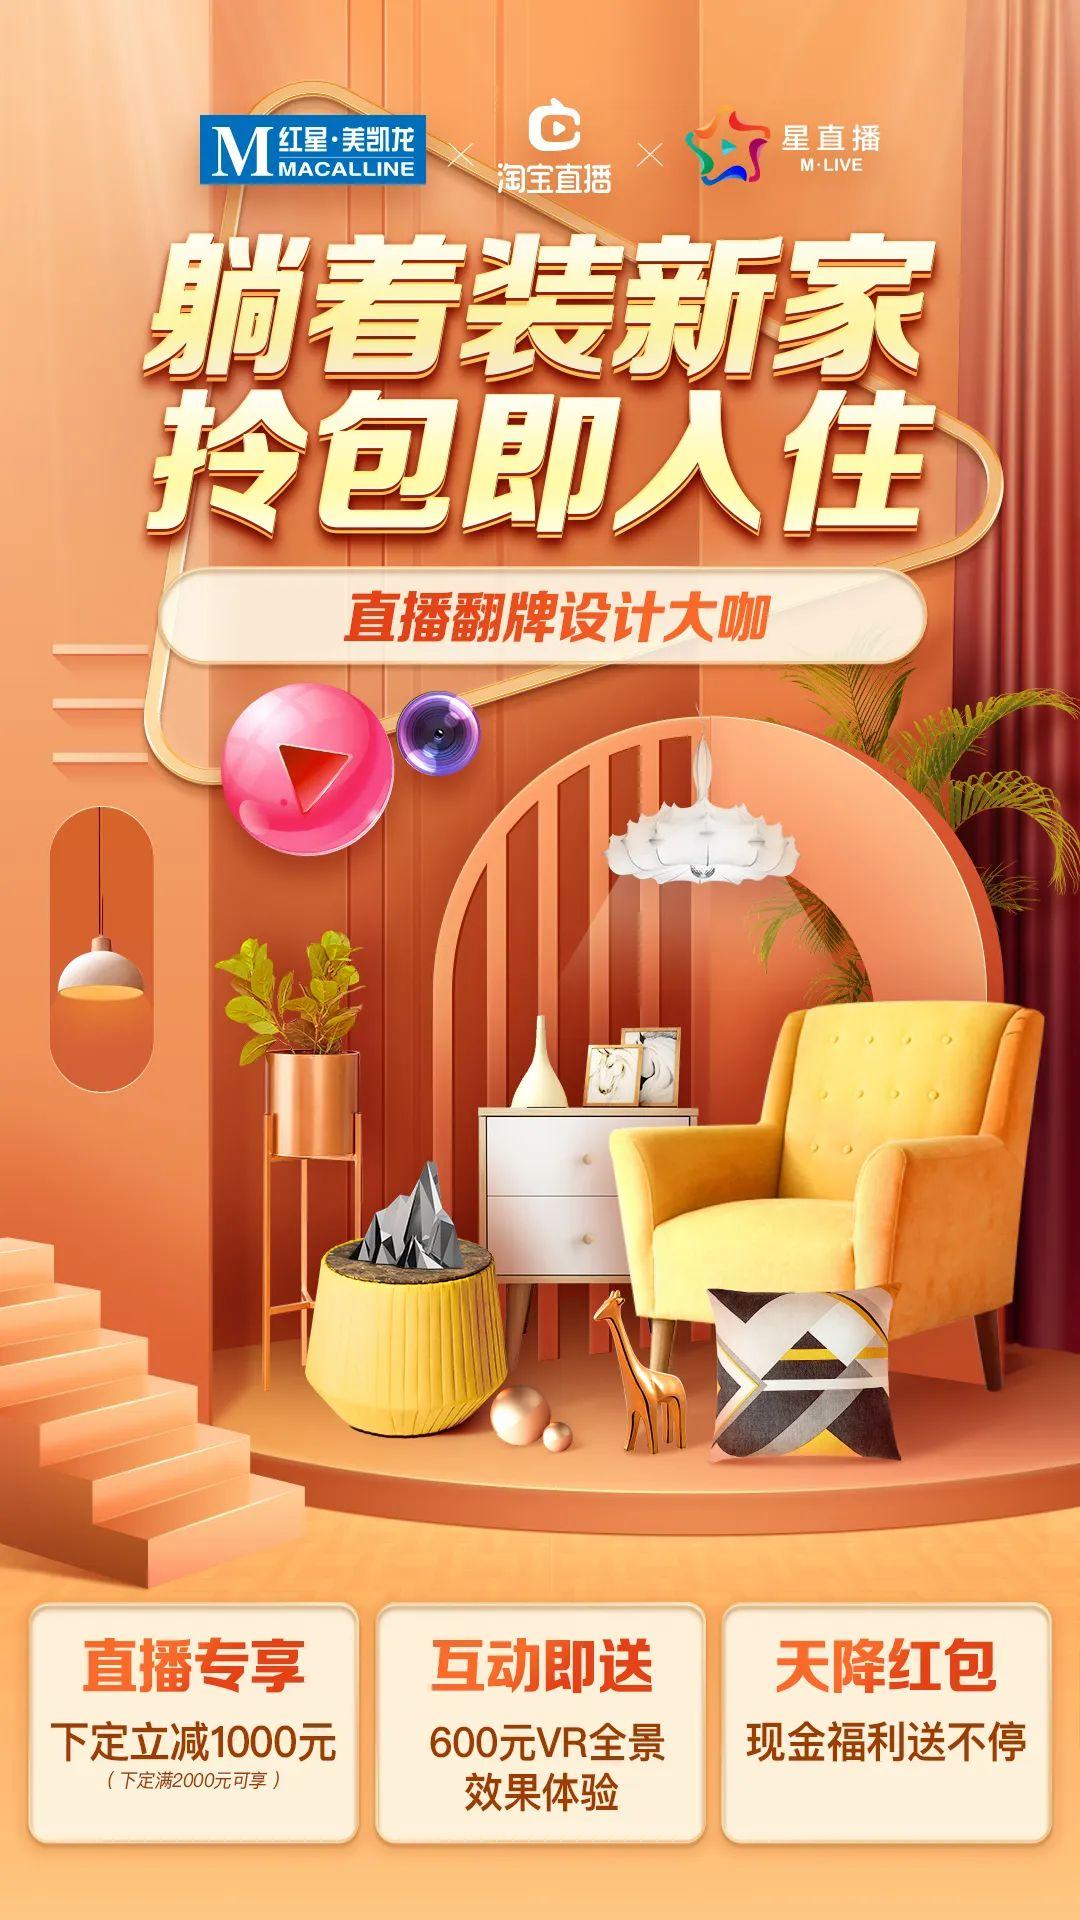 http://www.110tao.com/dianshanglingshou/241905.html